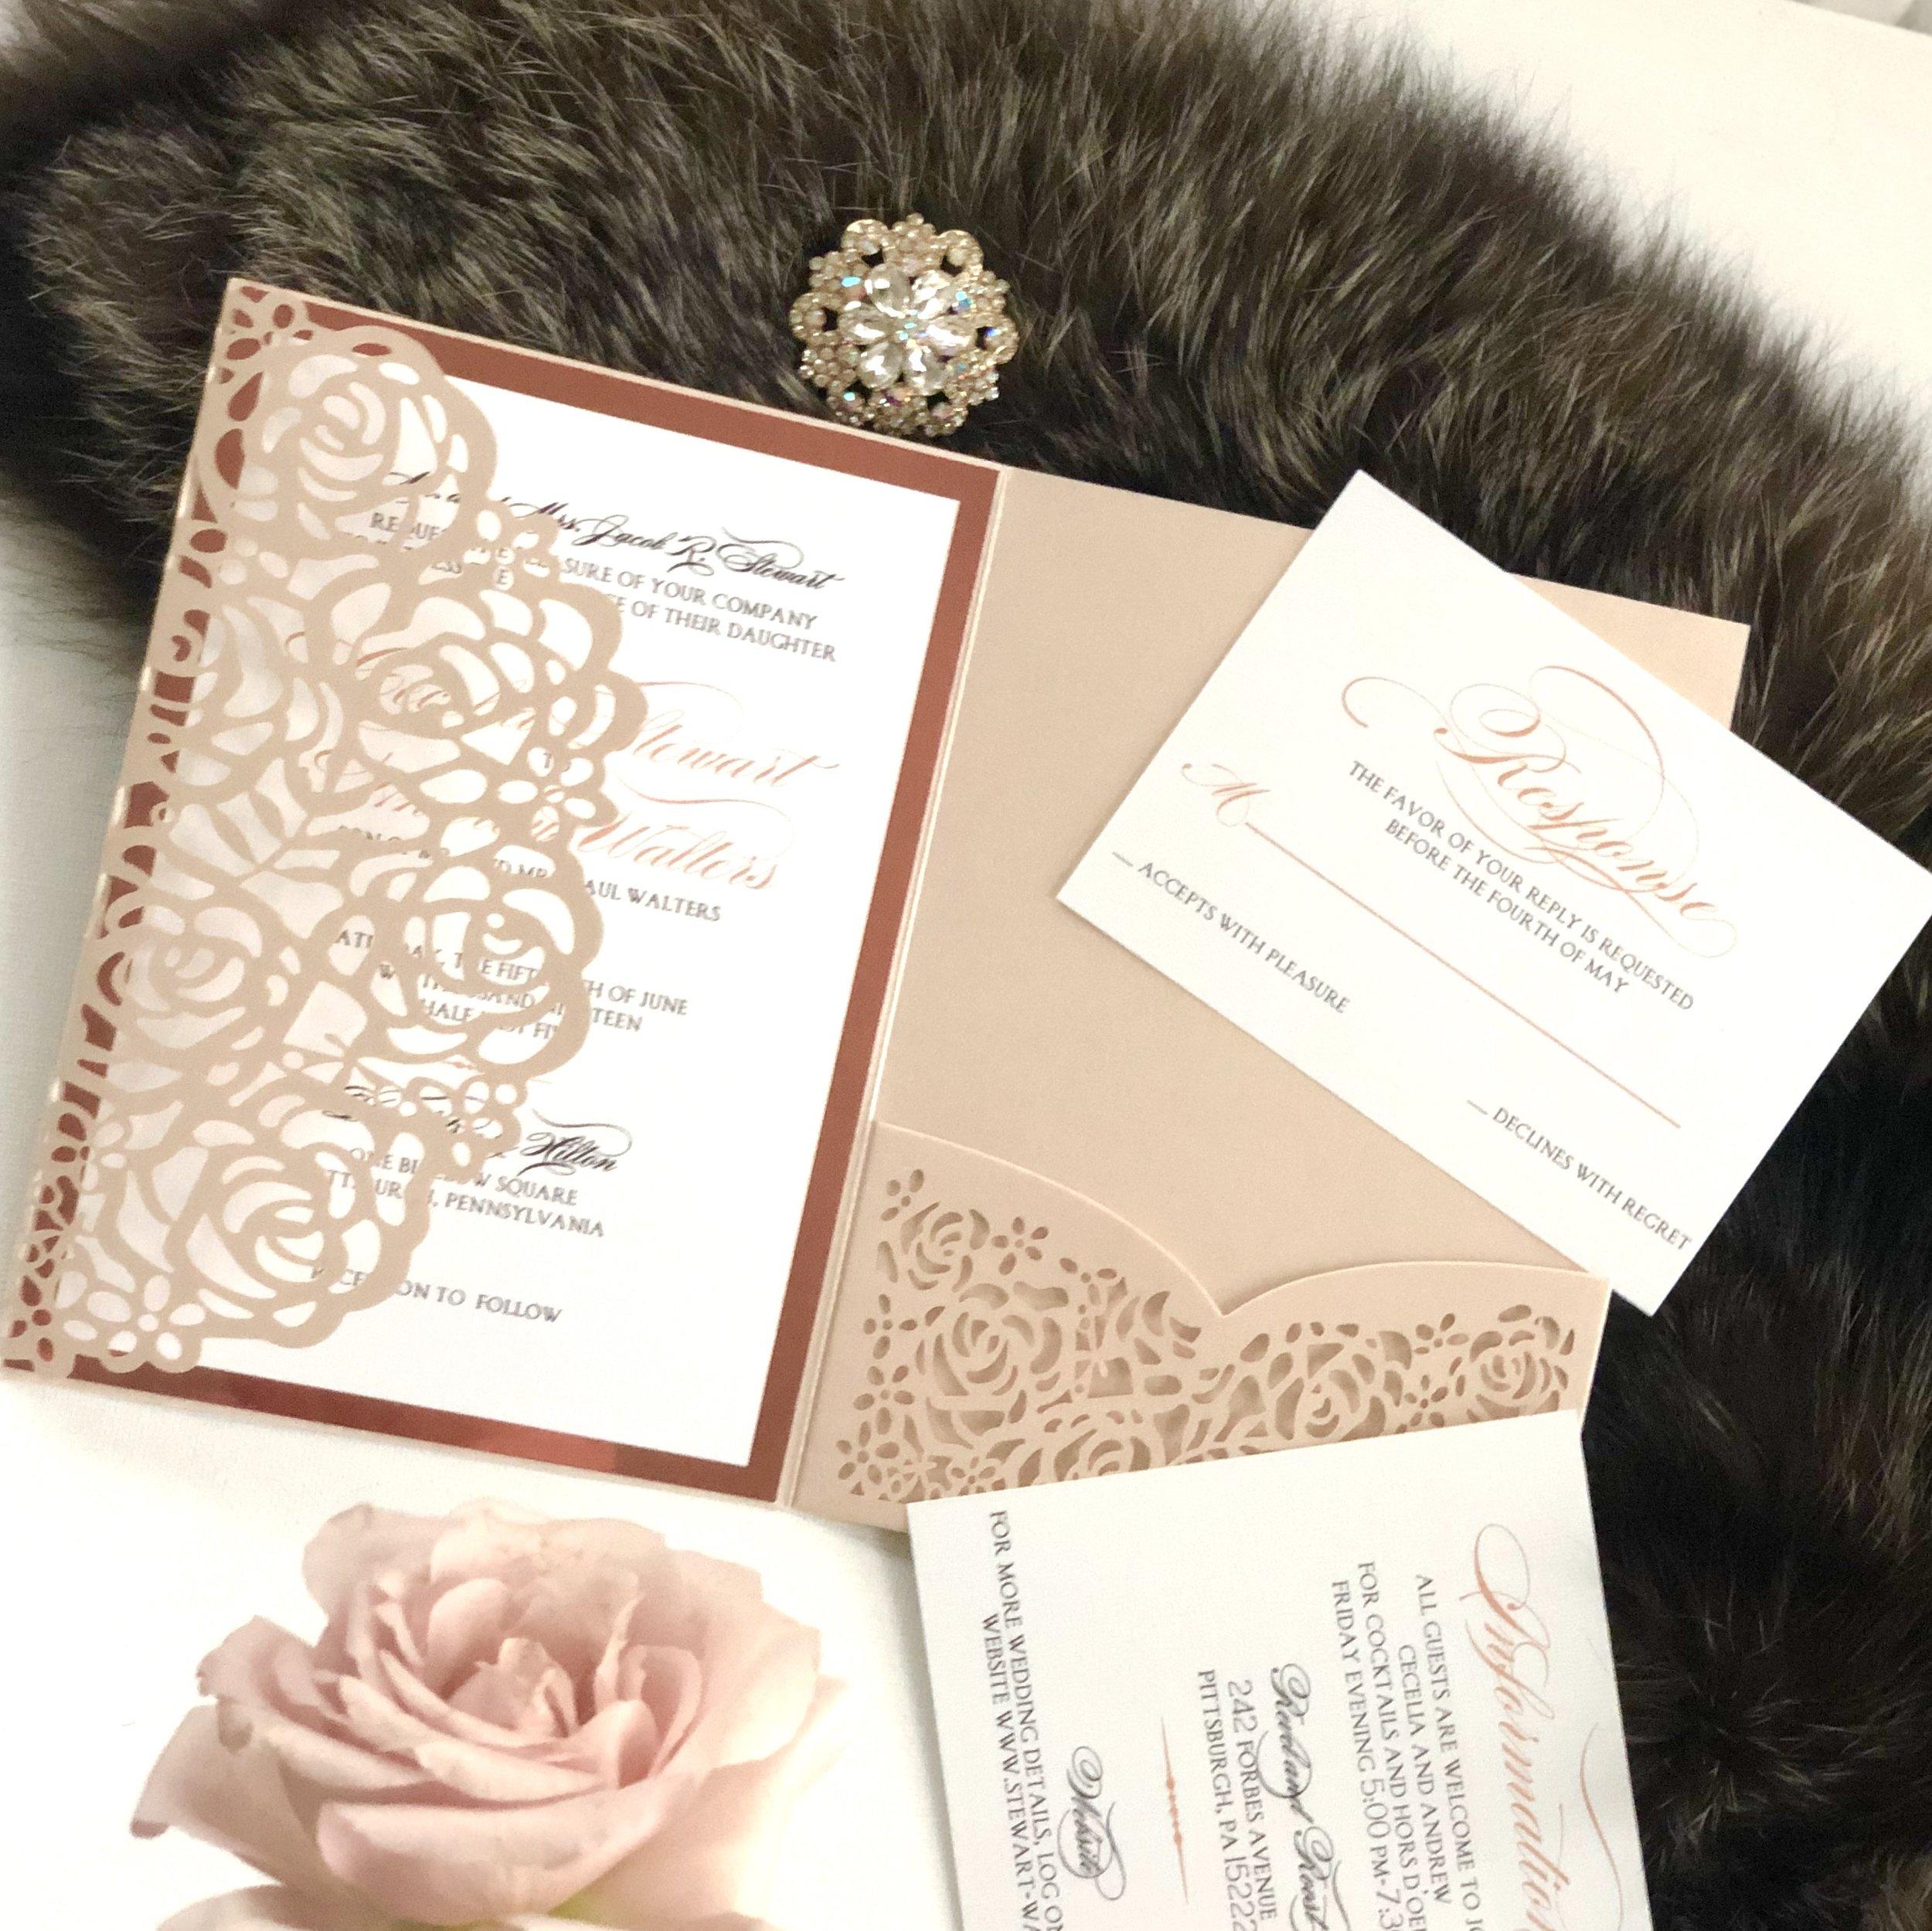 Rose-pattern-laser-cut-wedding-invitations-by-k-flowers-designs